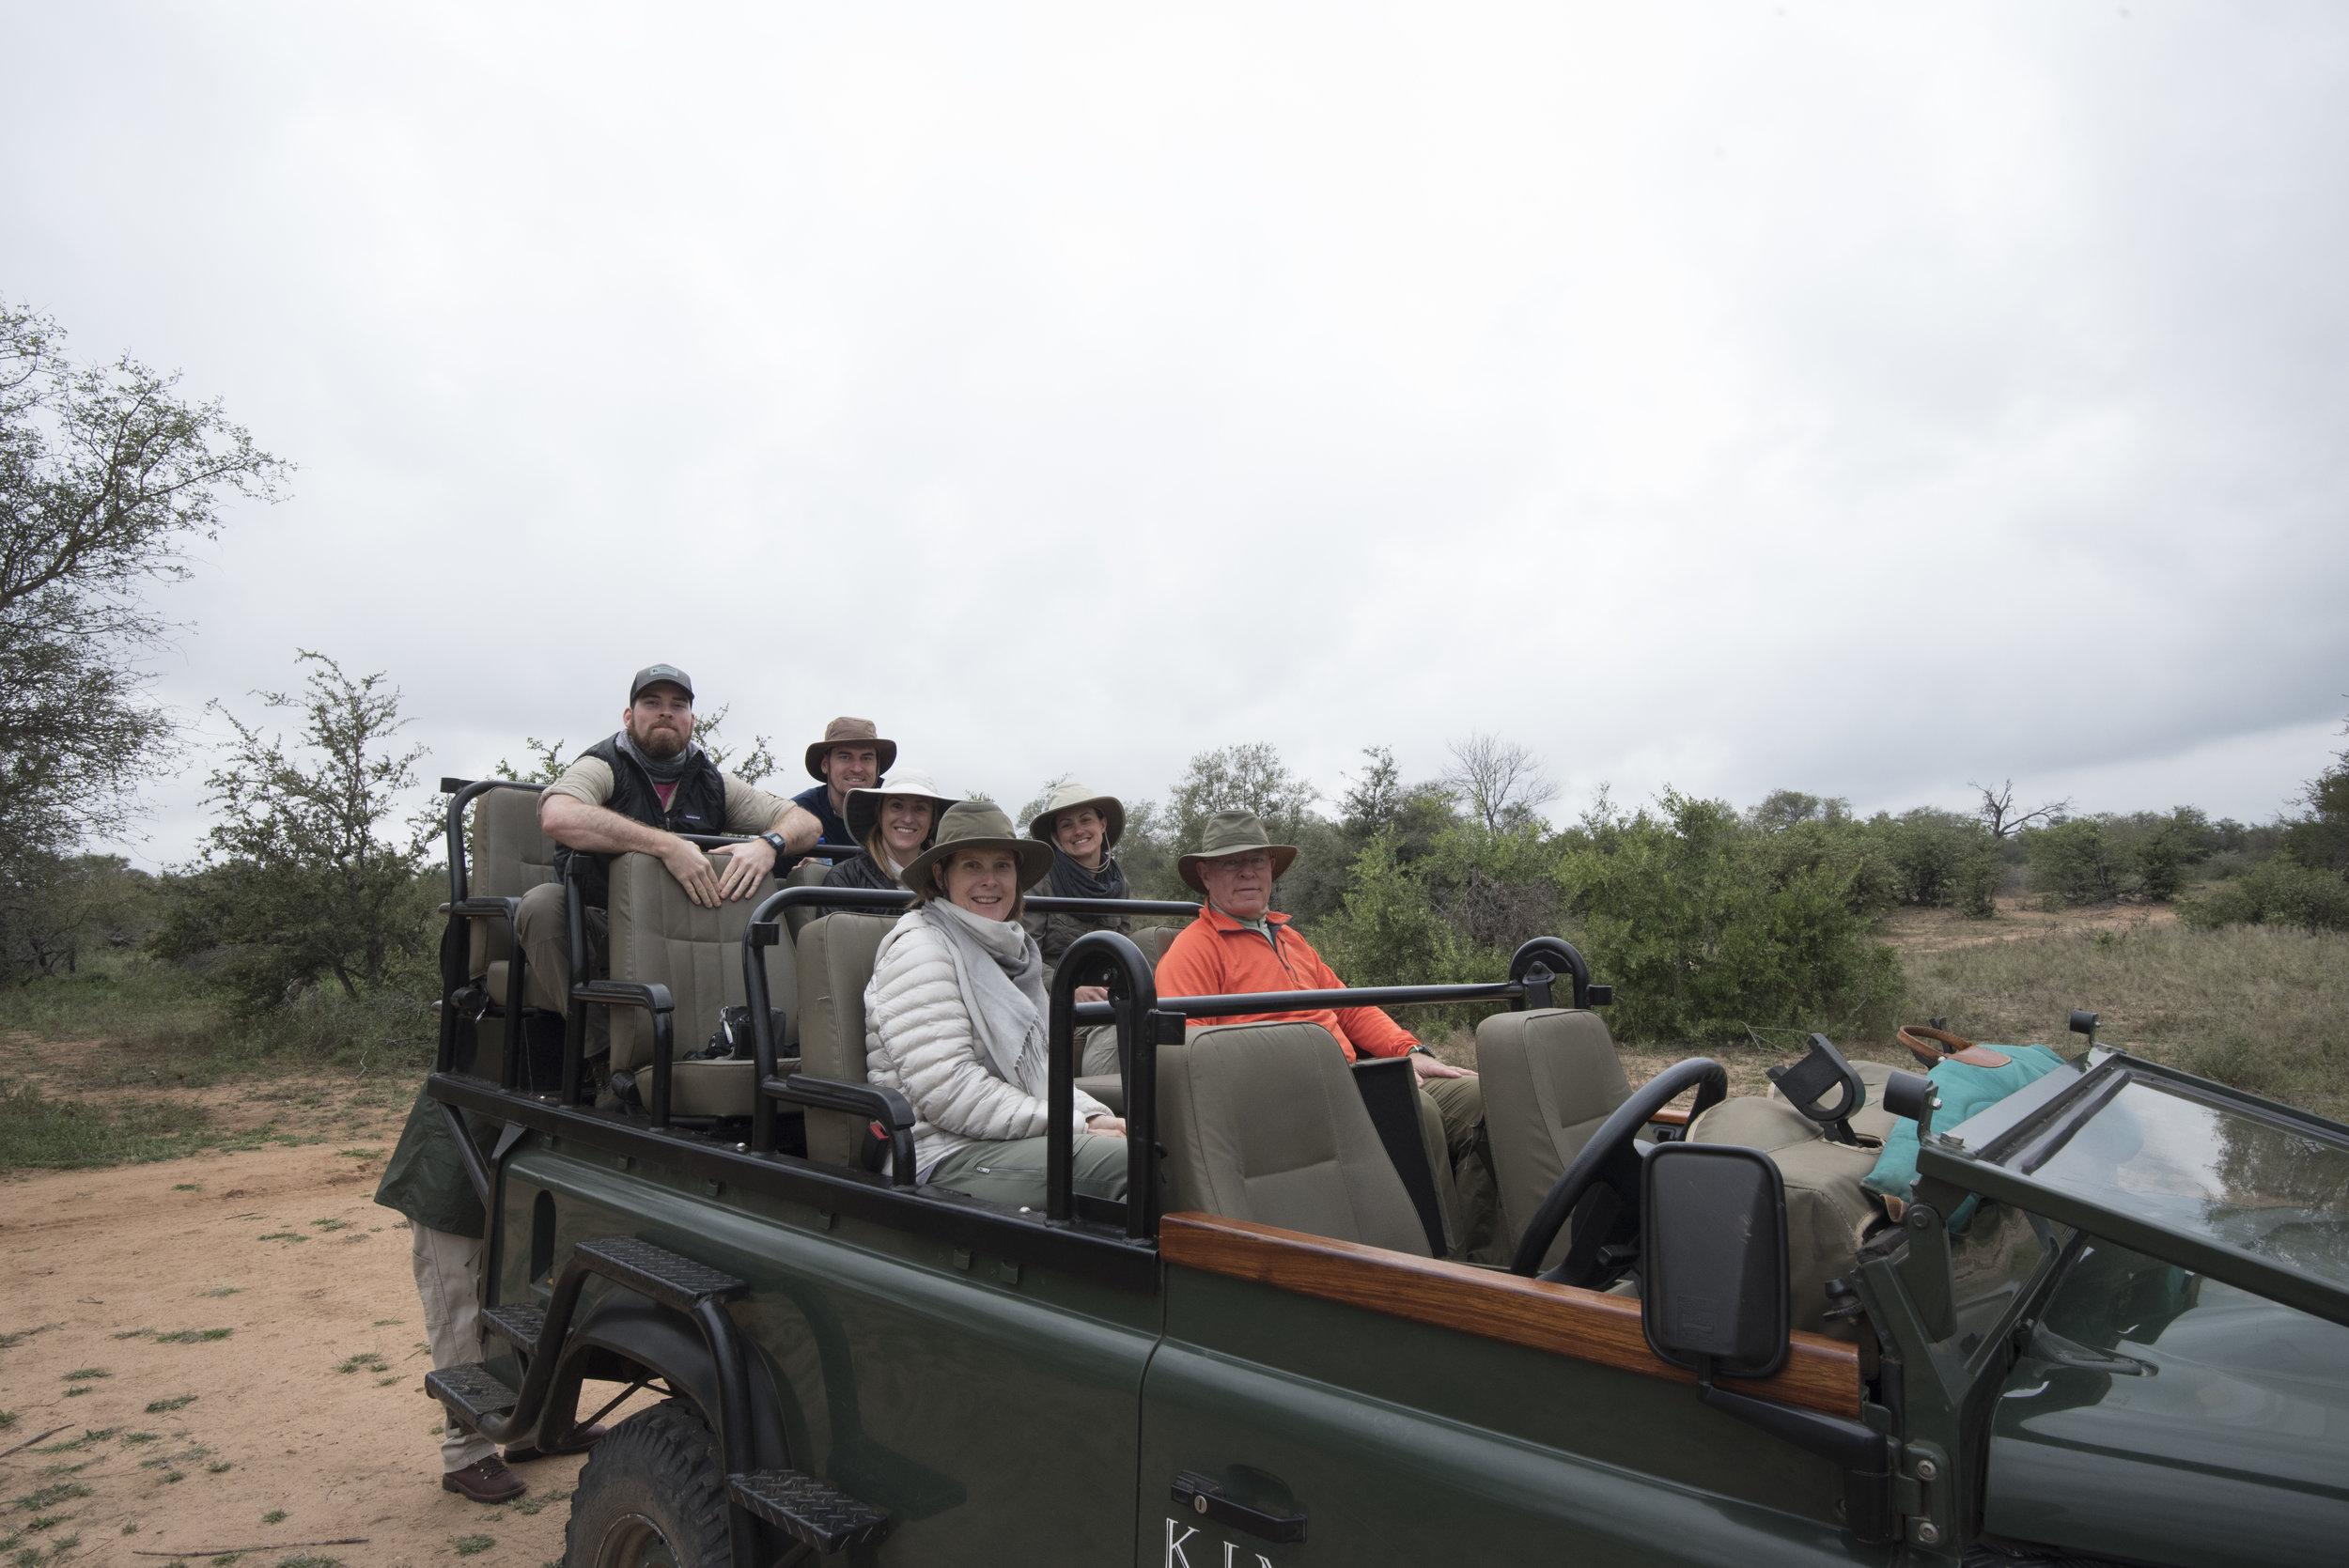 20170508-South Africa-050.jpg